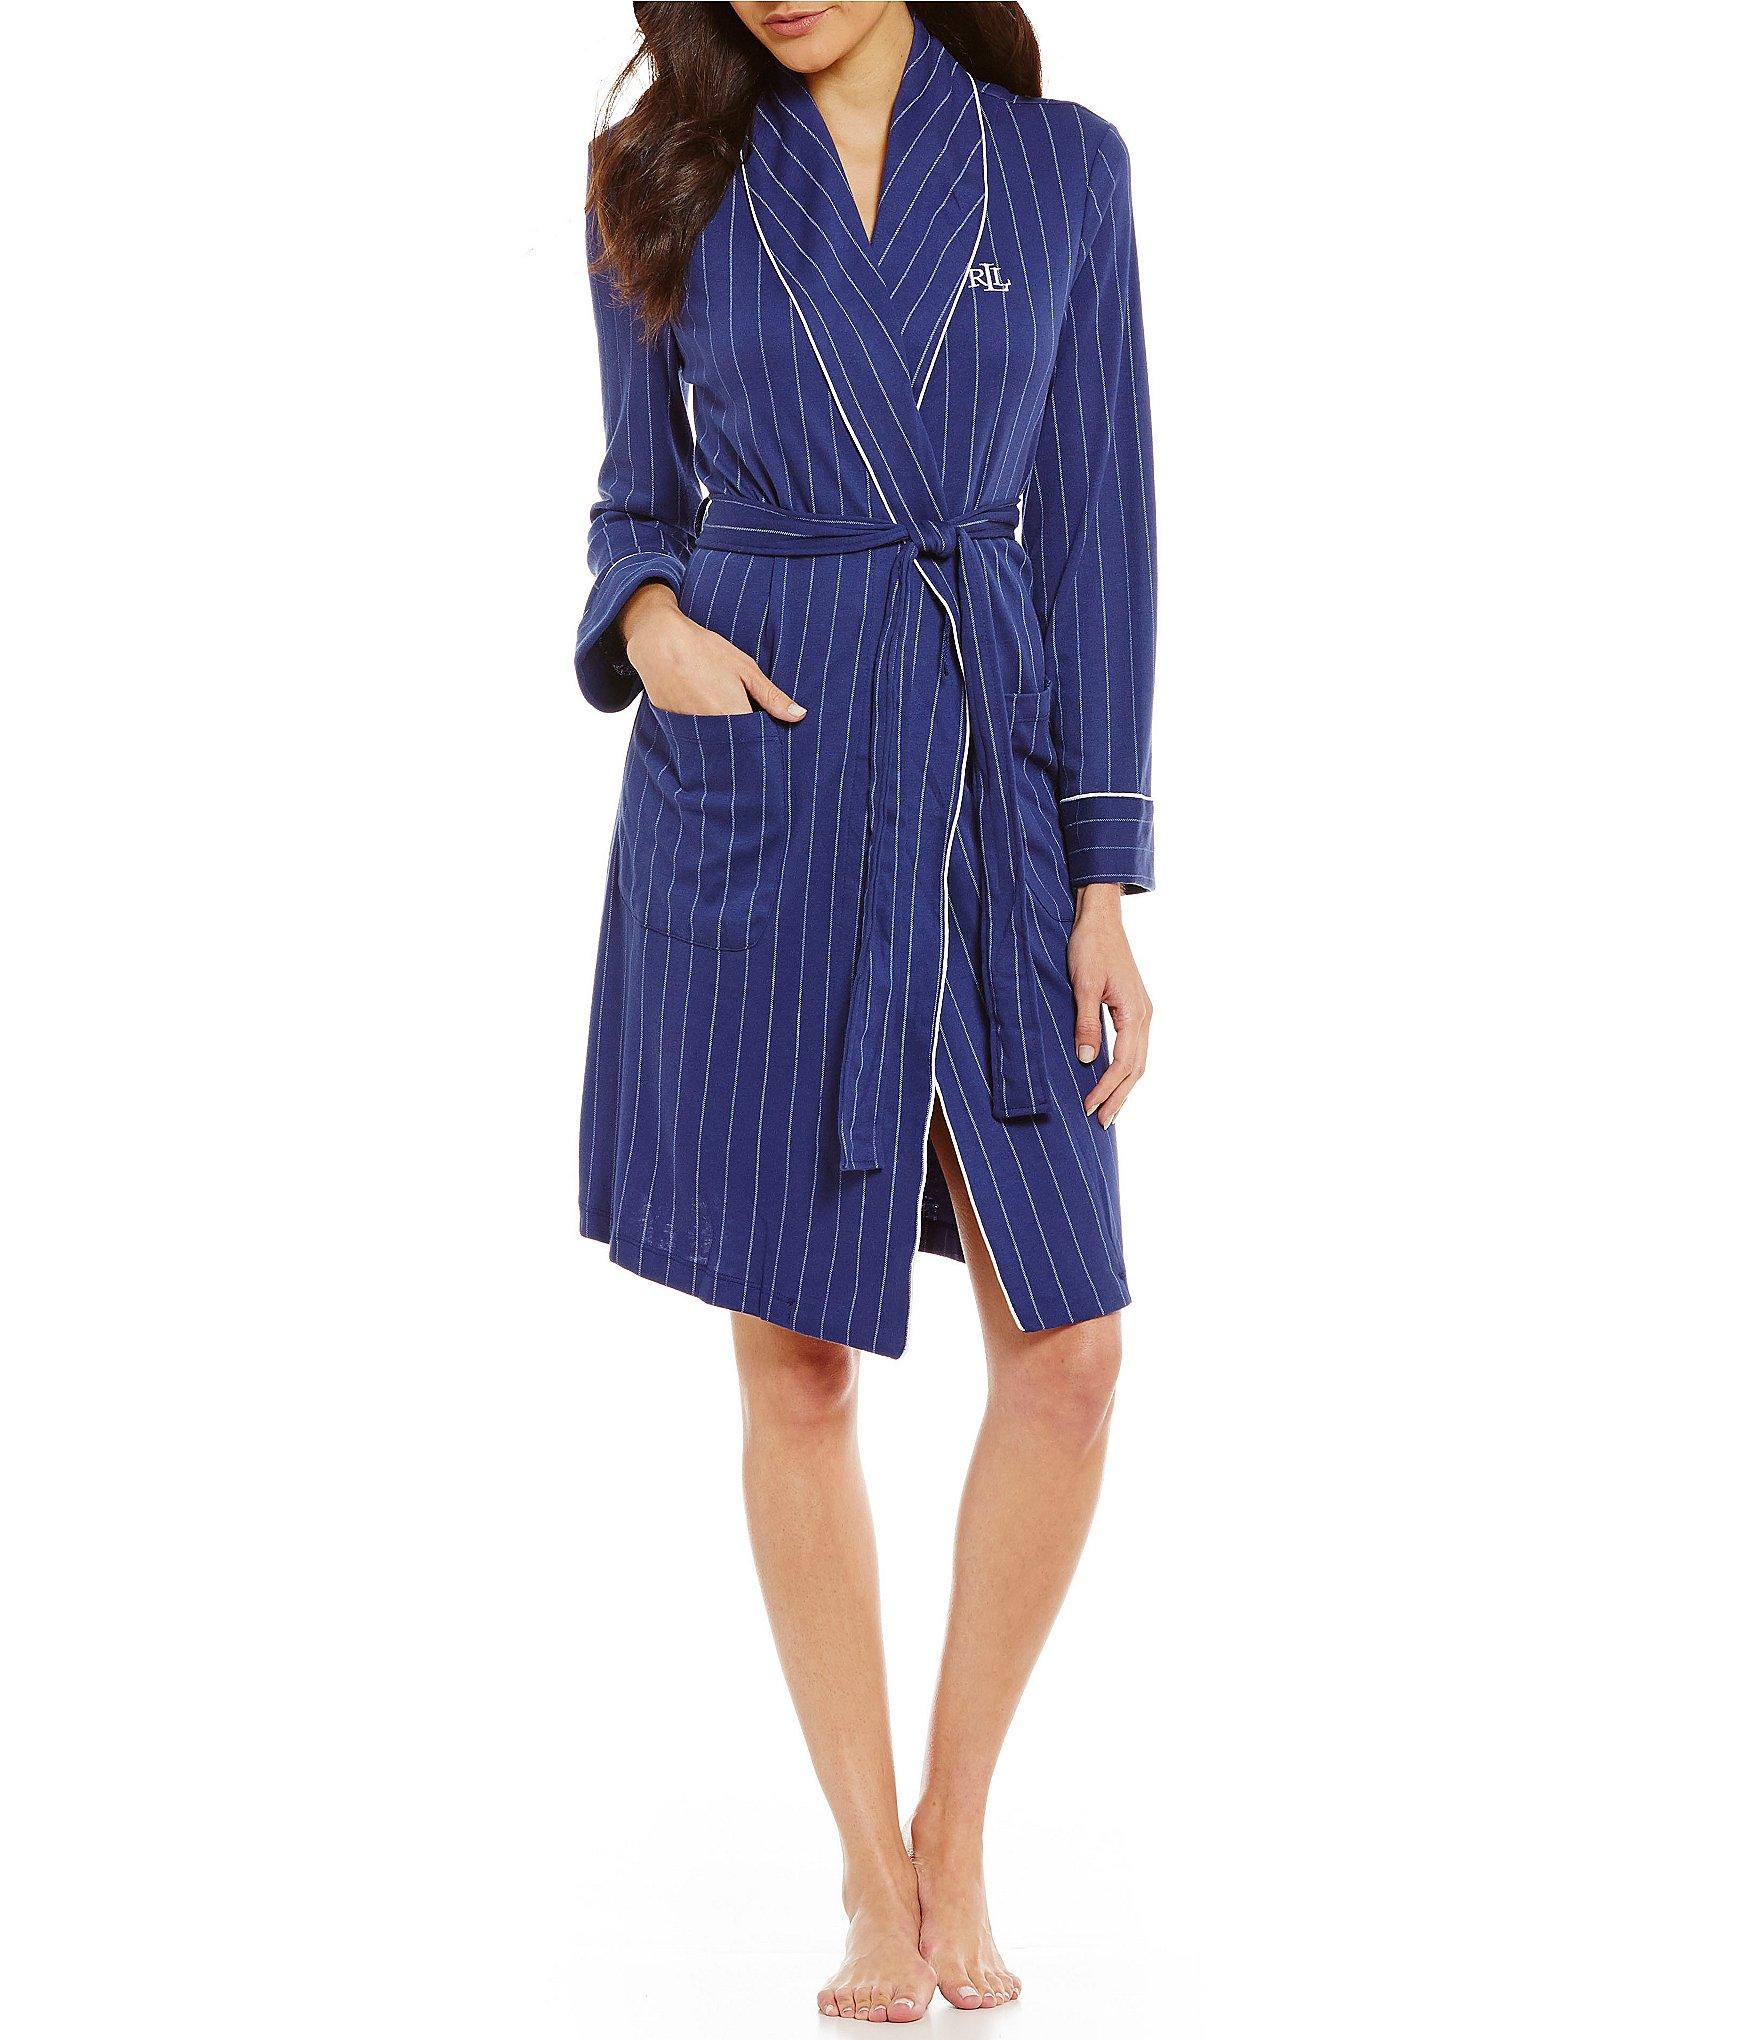 lauren ralph lauren striped robe dillards. Black Bedroom Furniture Sets. Home Design Ideas